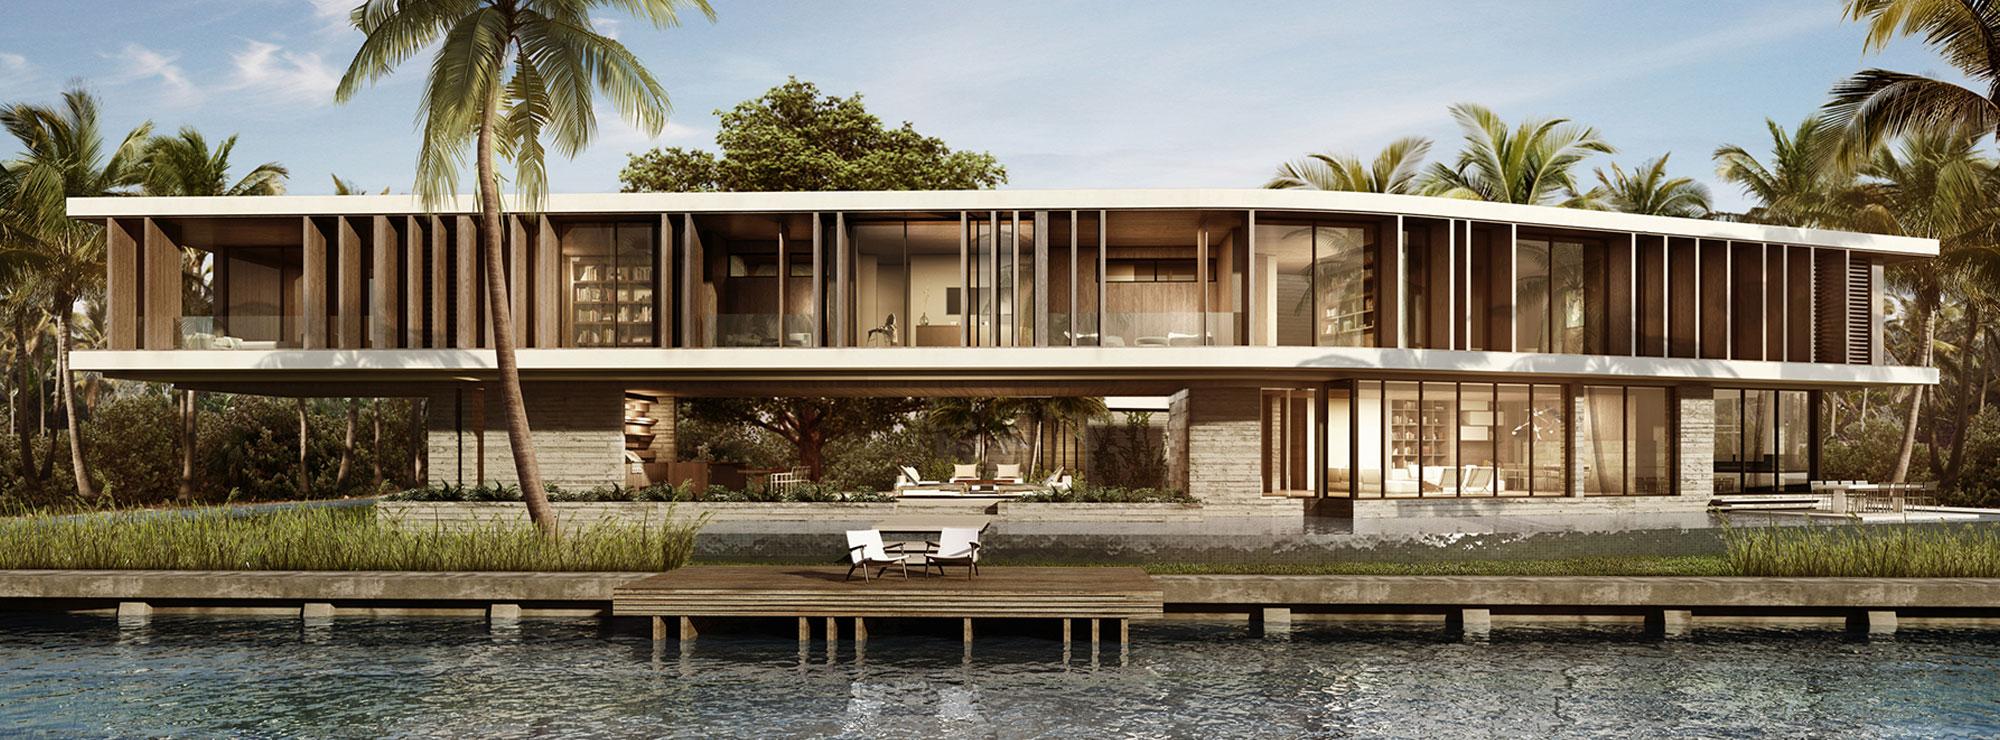 Tuckman Residence, Fort Lauderdale, Forida